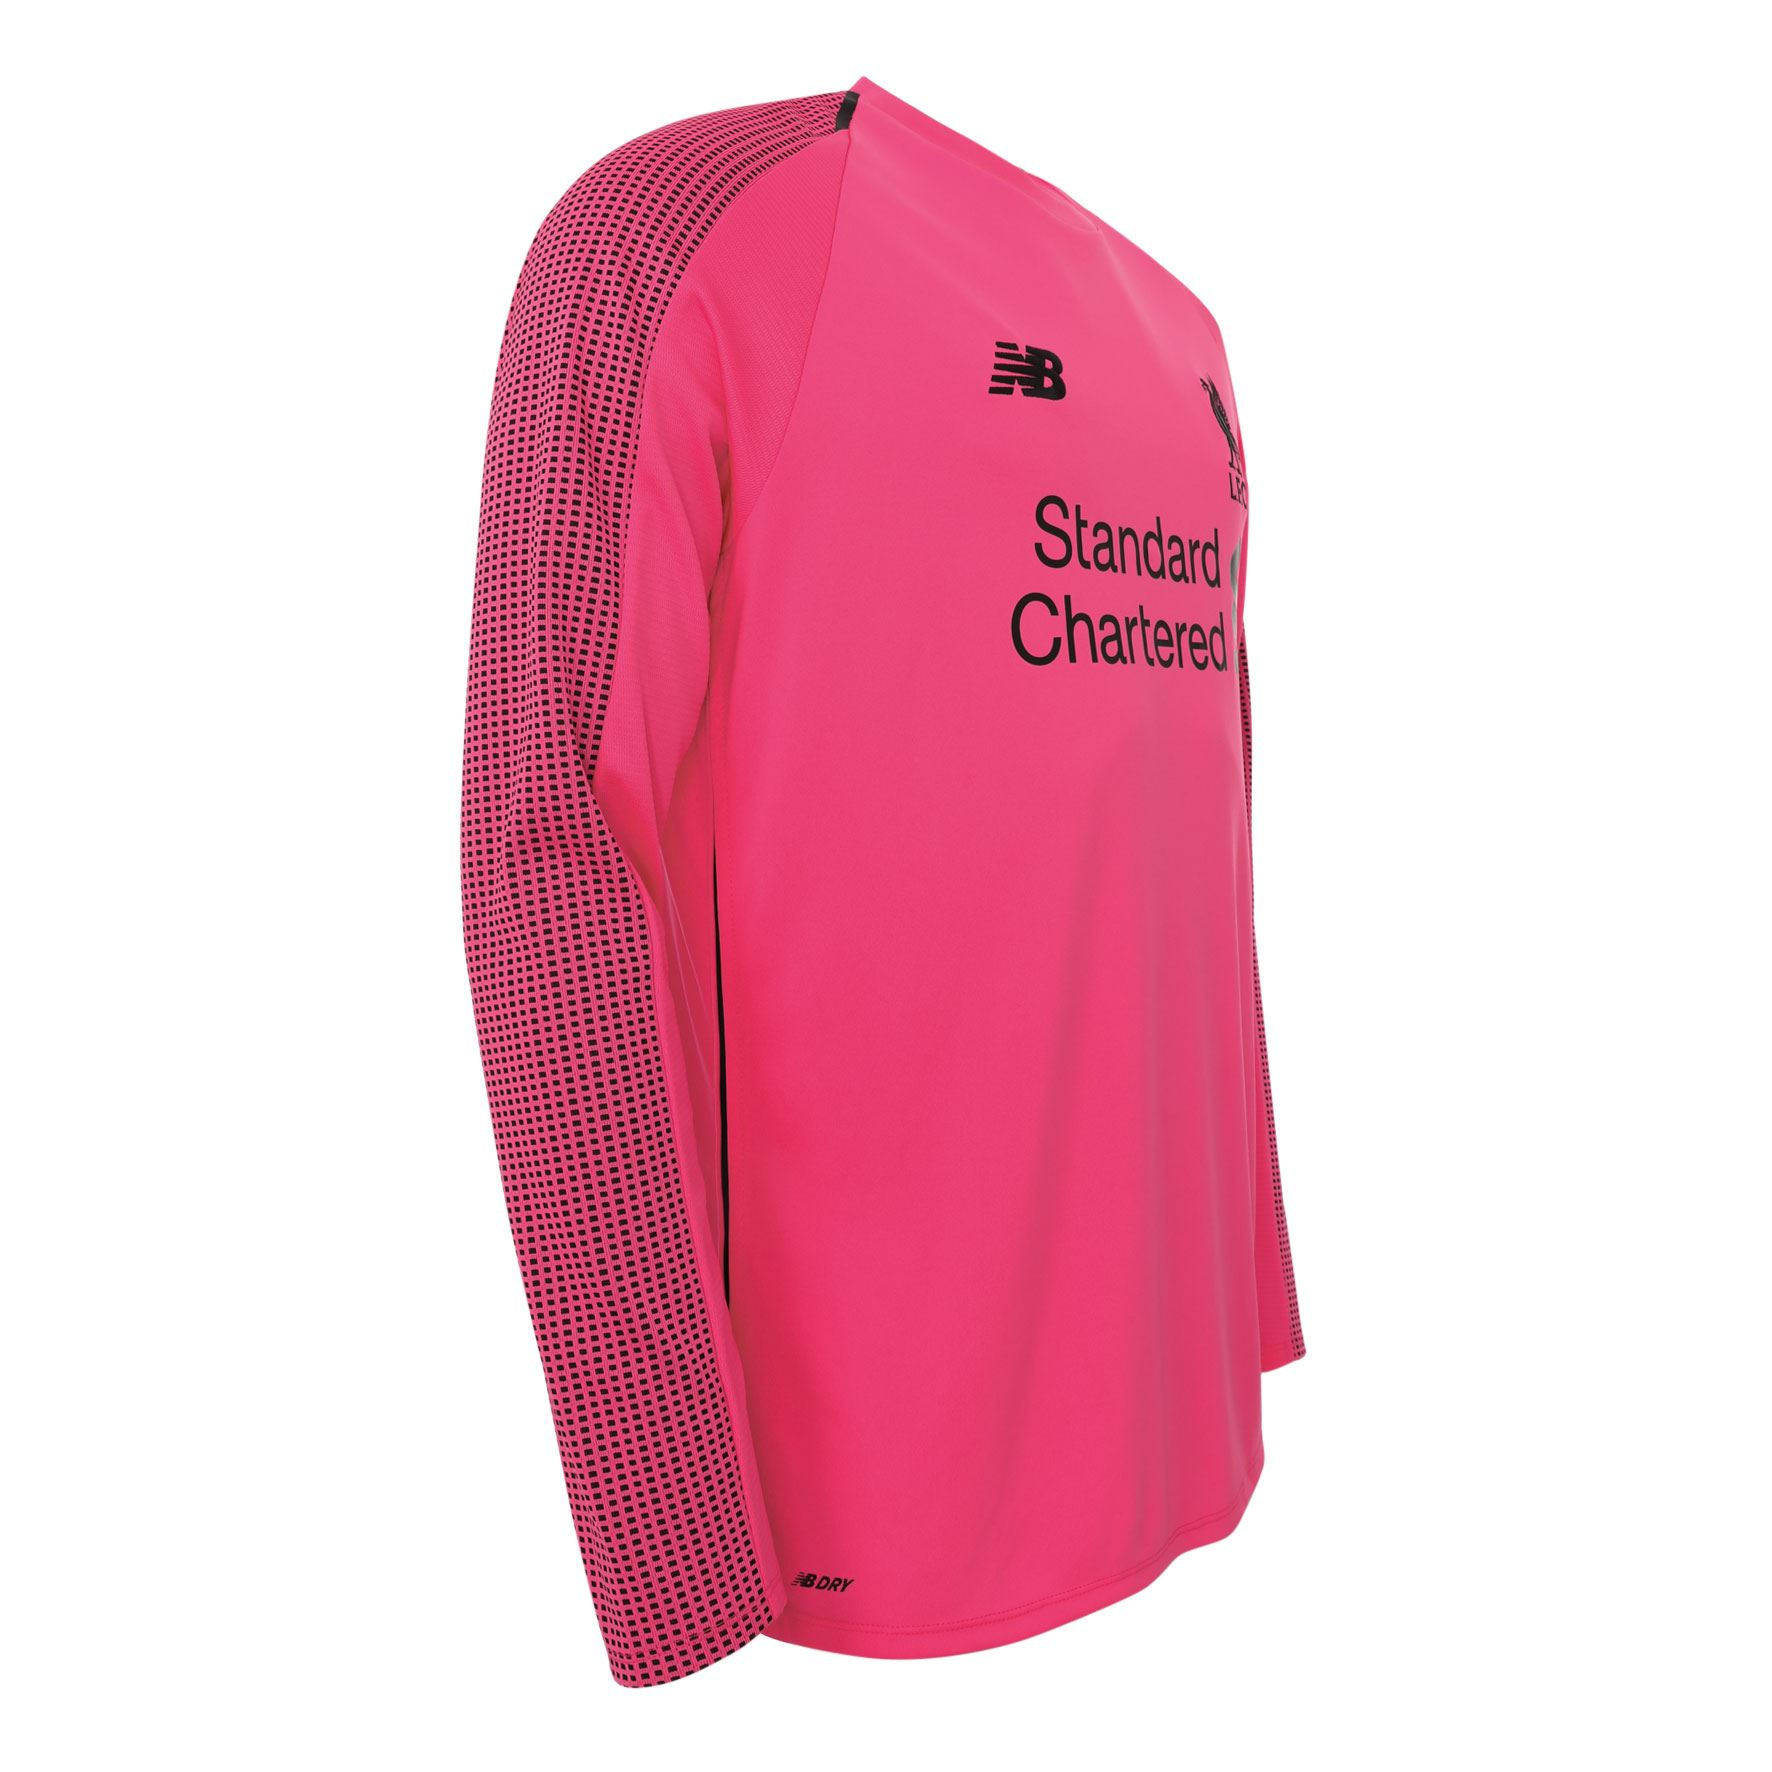 6c1390630 Liverpool Fc Manga Longa Rosa Meninos Futebol Camisa Goleiro Third ...